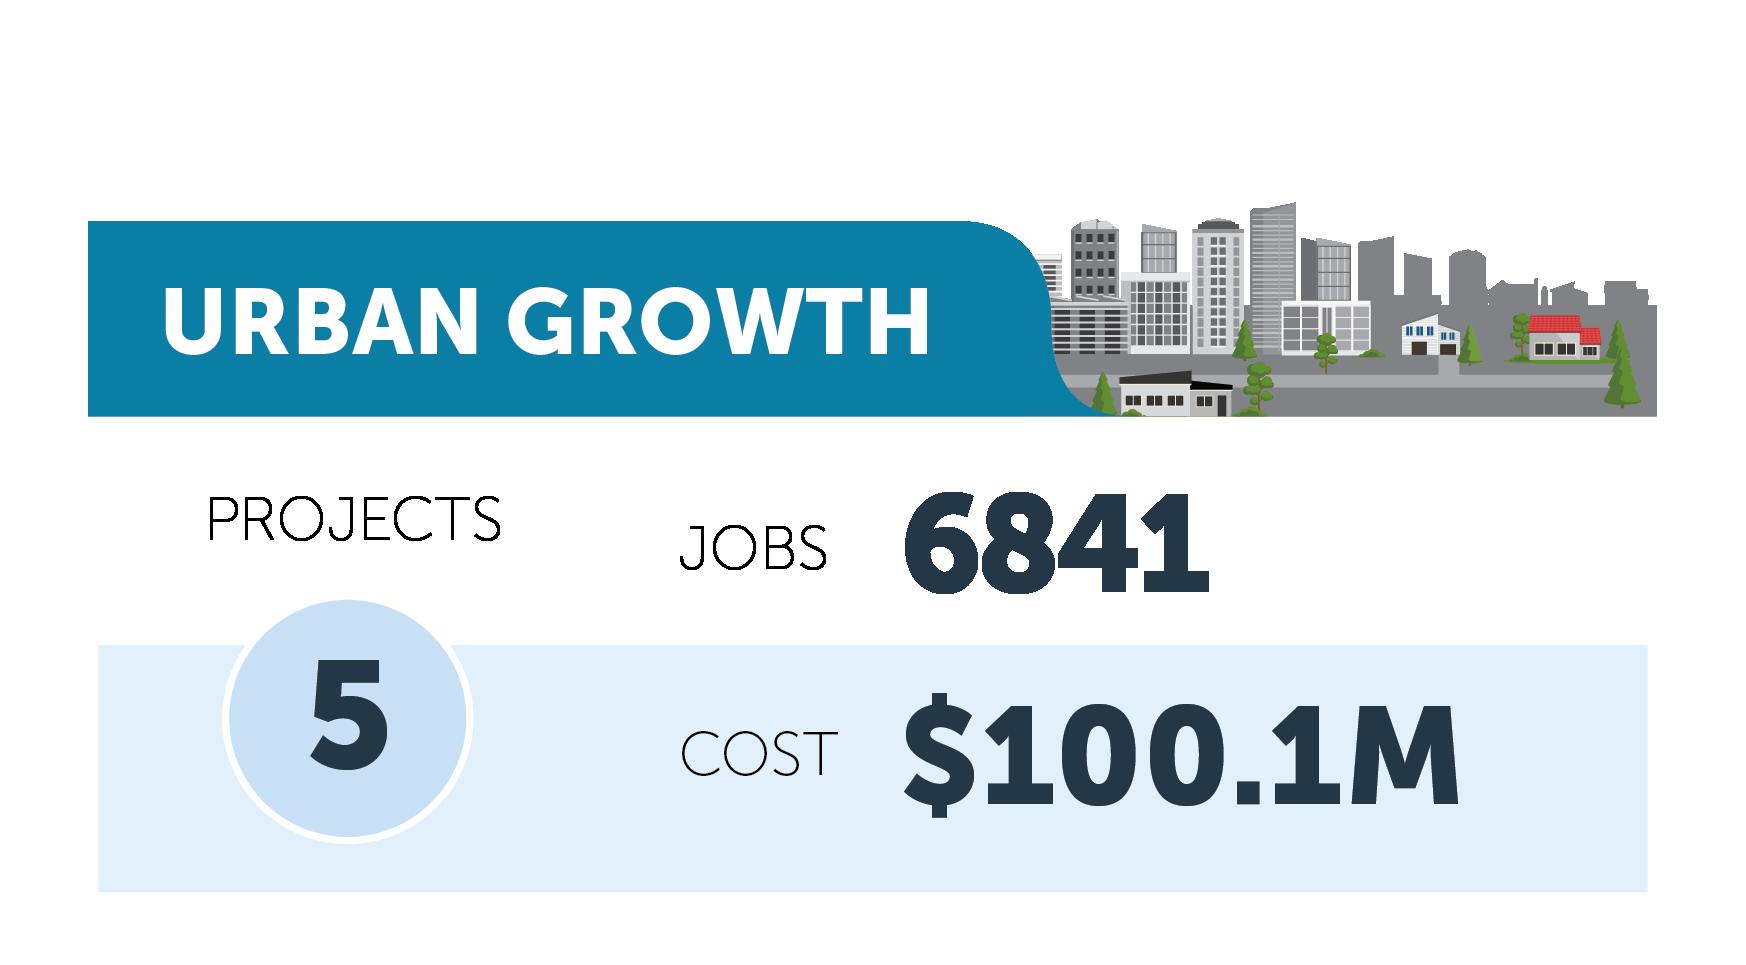 Urban Growth figures